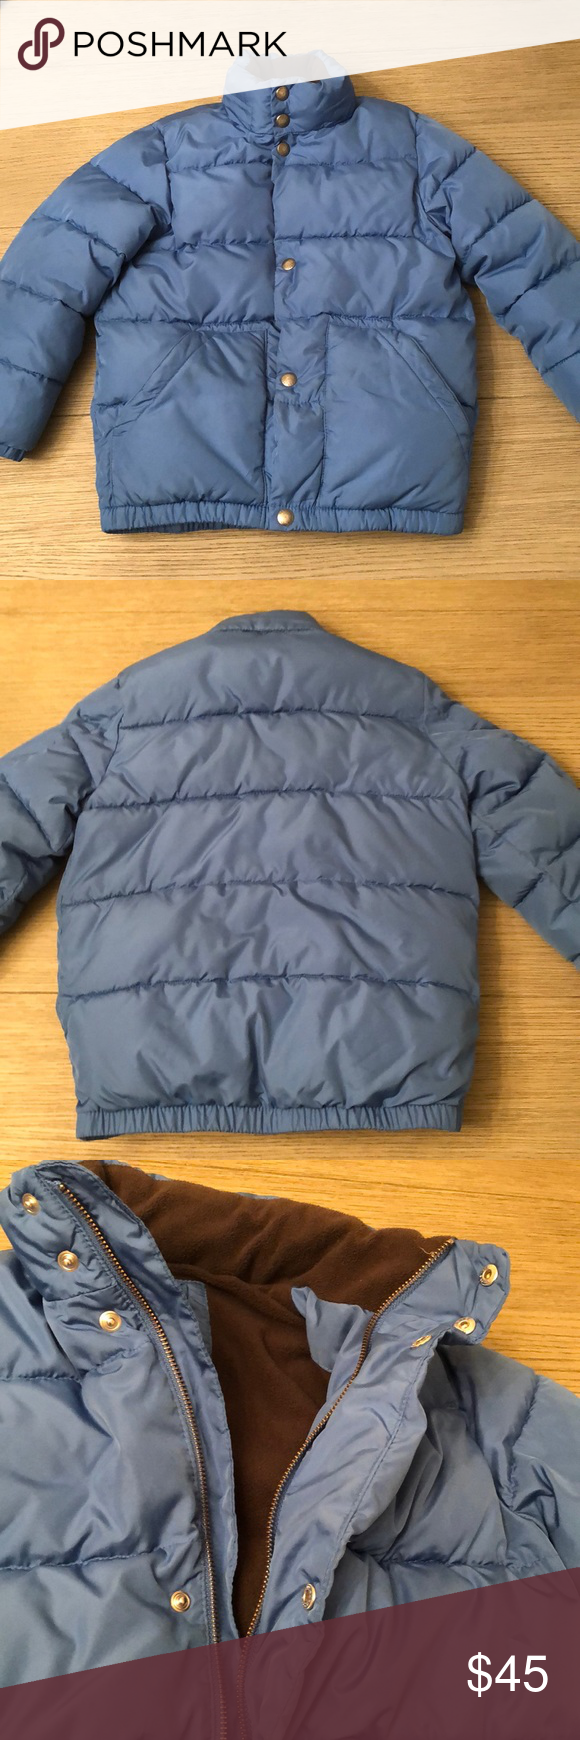 Gap Kids Primaloft Puffer Jacket Jackets Gap Kids Gap Jacket [ 1740 x 580 Pixel ]